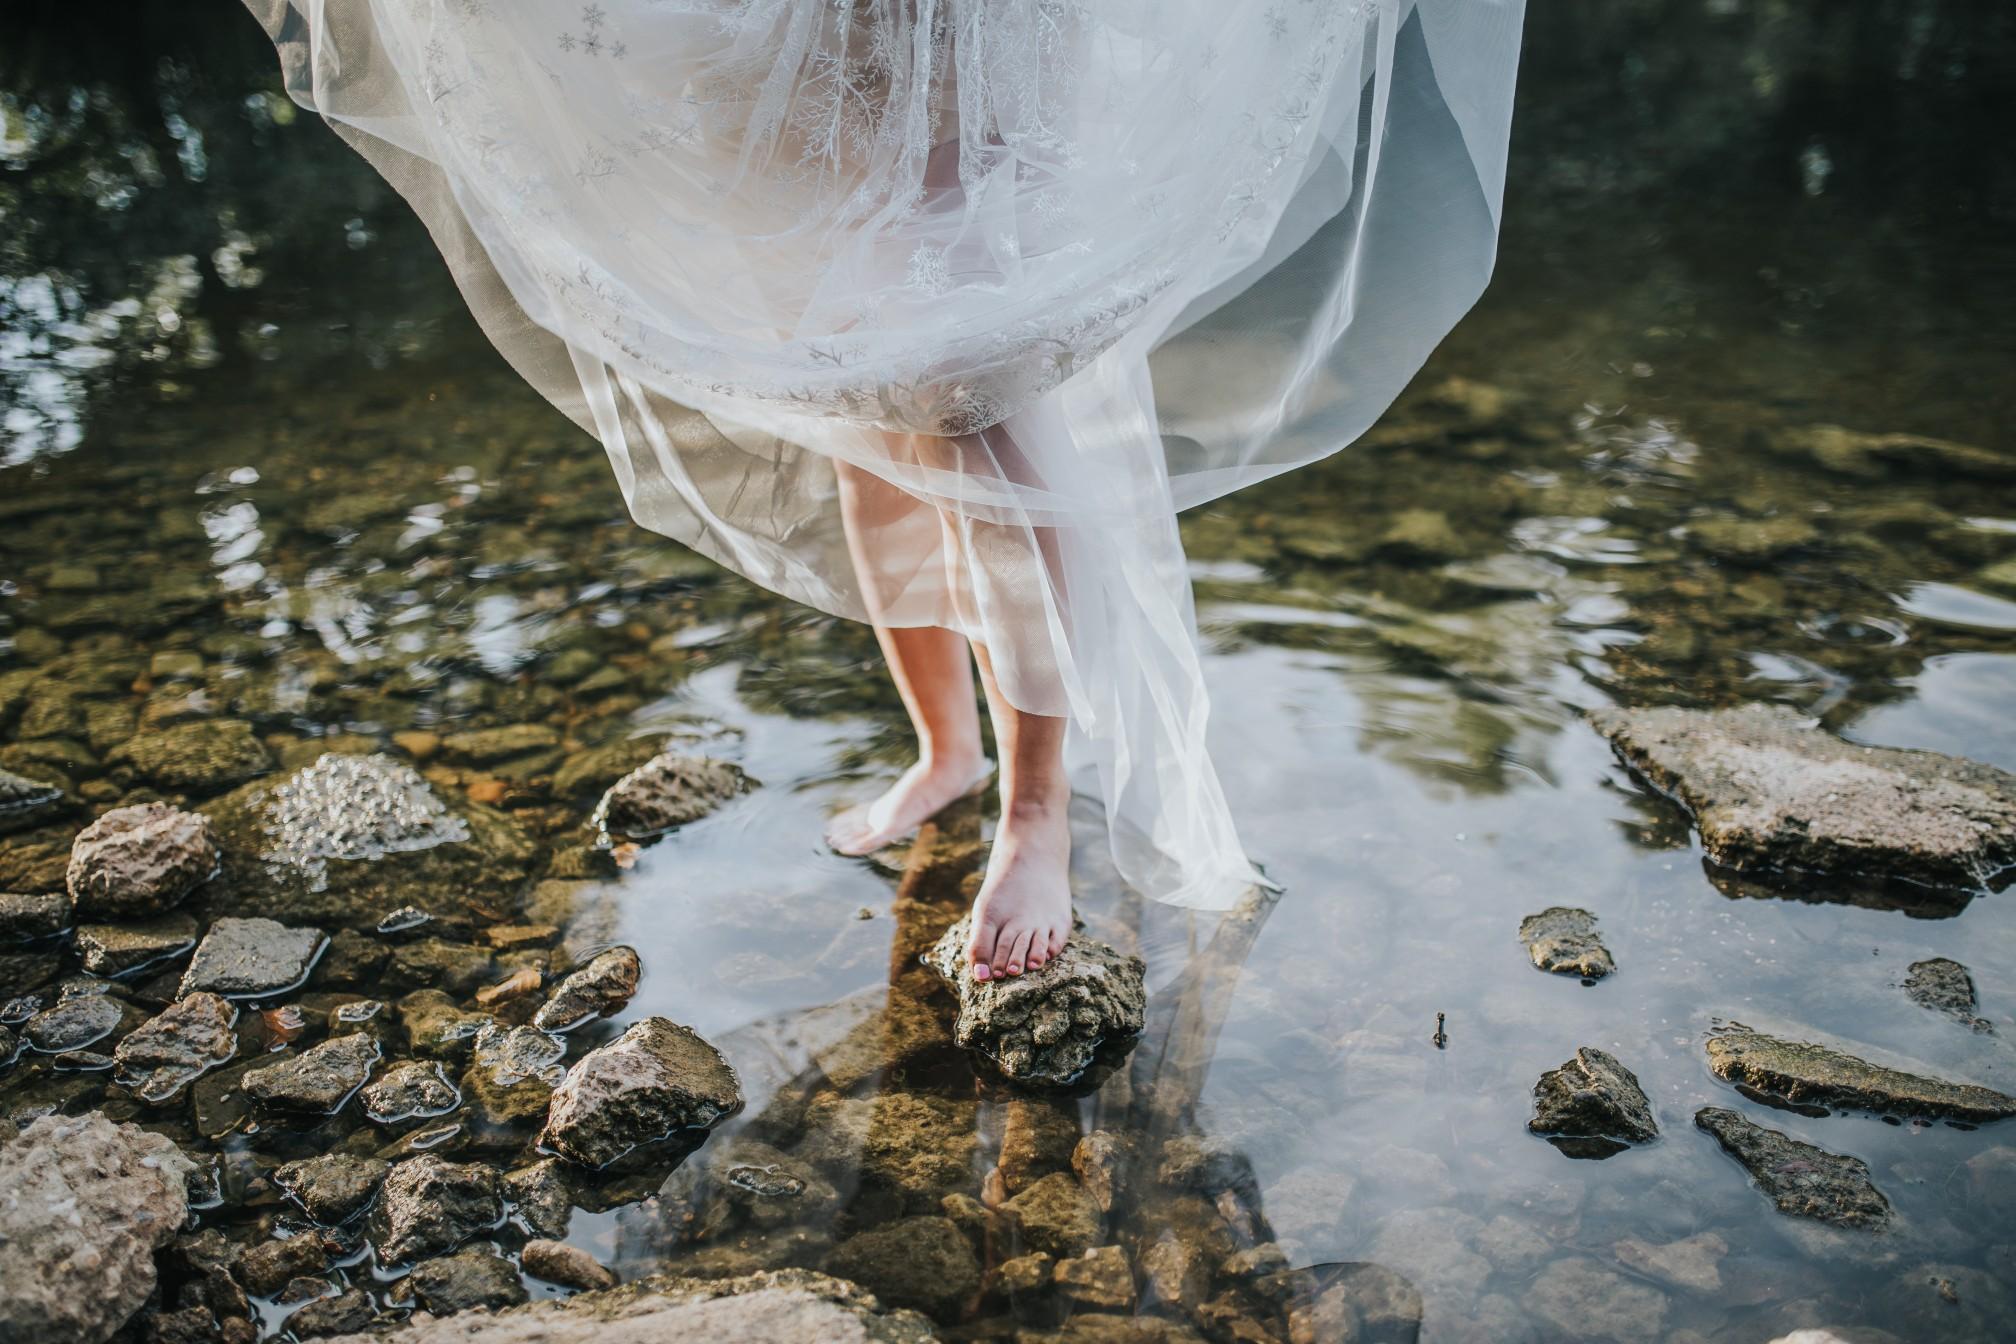 fairy wedding - whimsical wedding - magical wedding - elegant wedding dress - barefoot bride